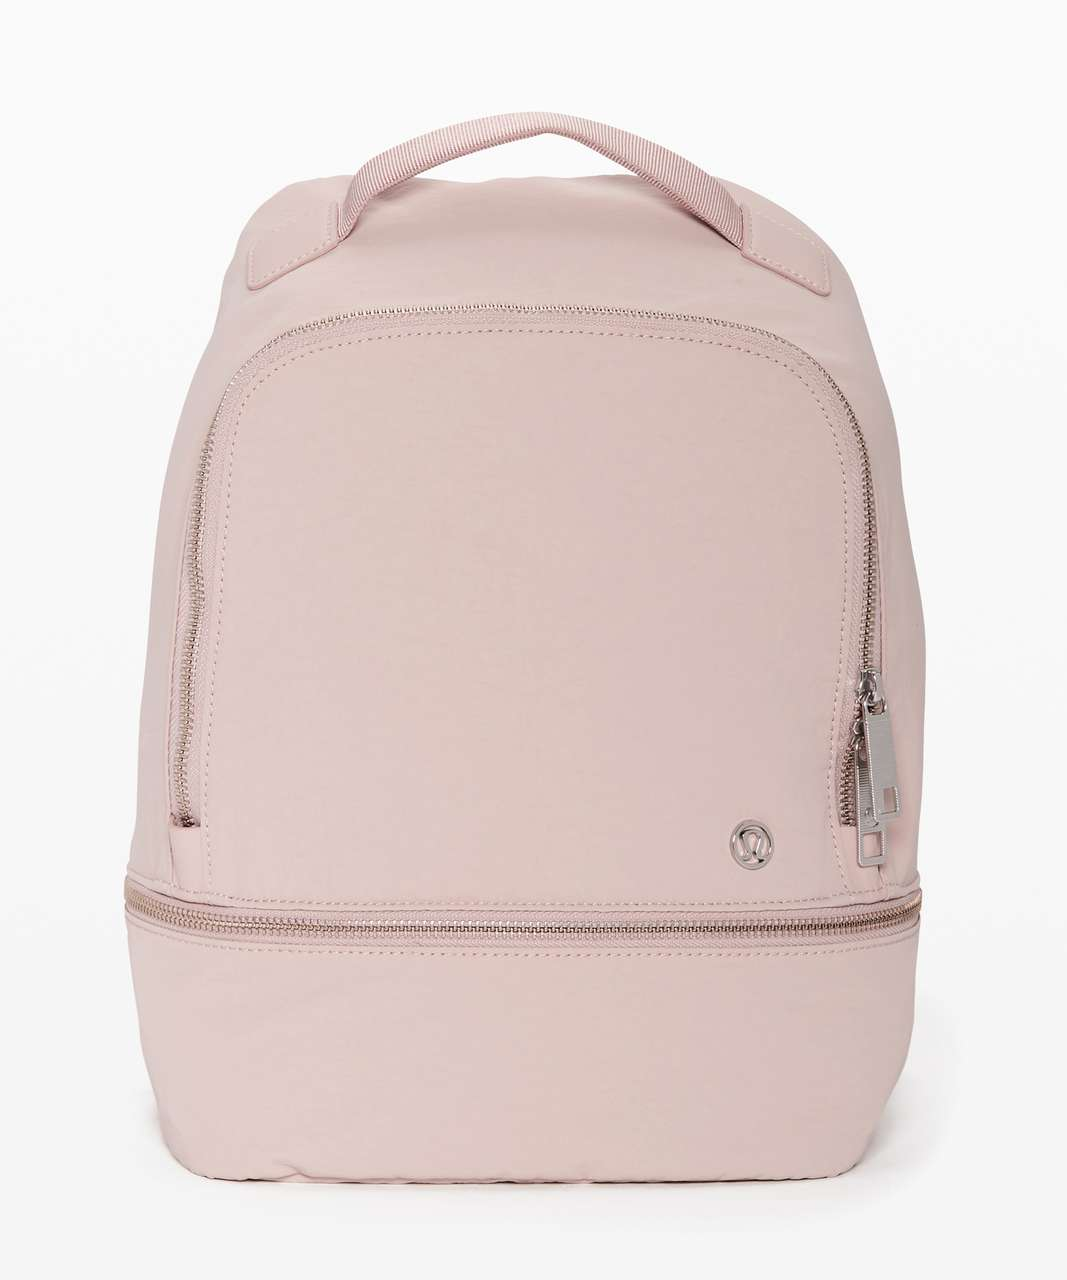 Lululemon City Adventurer Backpack *Mini 12L - Muse